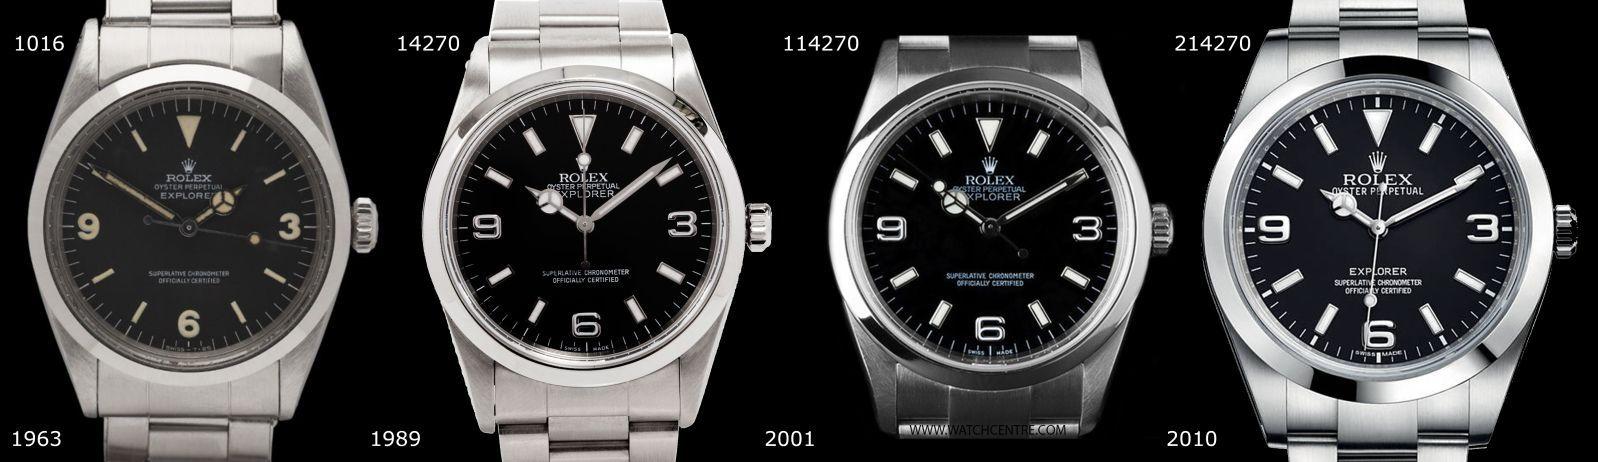 Which Rolex Explorer 14270 or 114270 or 214270??? #rolexexplorer Which Rolex Explorer 14270 or 114270 or 214270??? #rolexexplorer